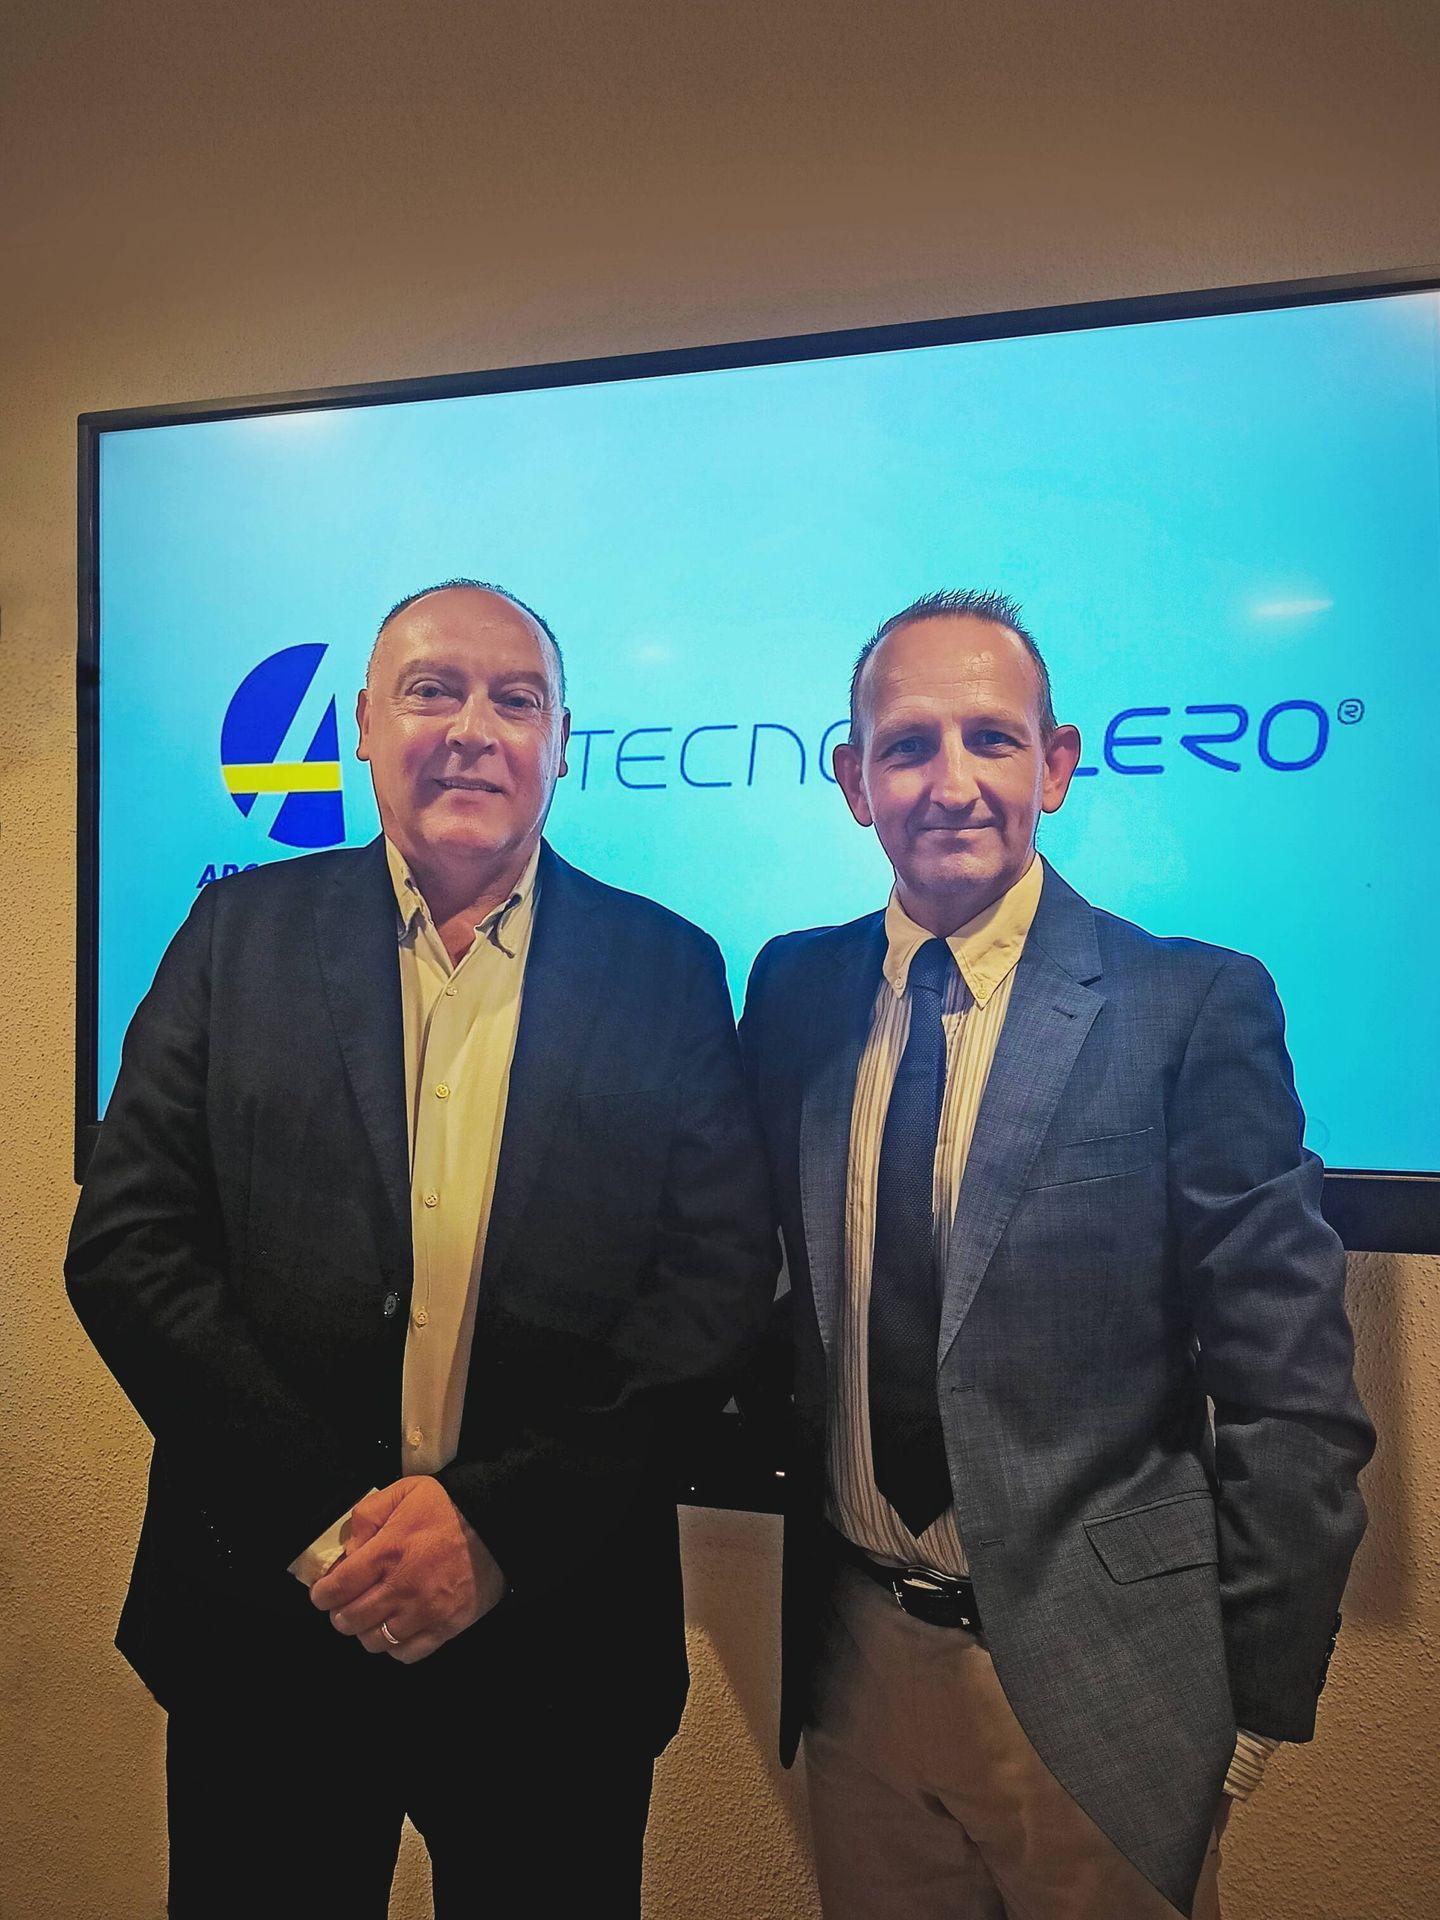 Javier Lavernia y Gerard Aragonés, máximos responsables de Tecnovelero y Arcamo Controls S.A. respectivamente